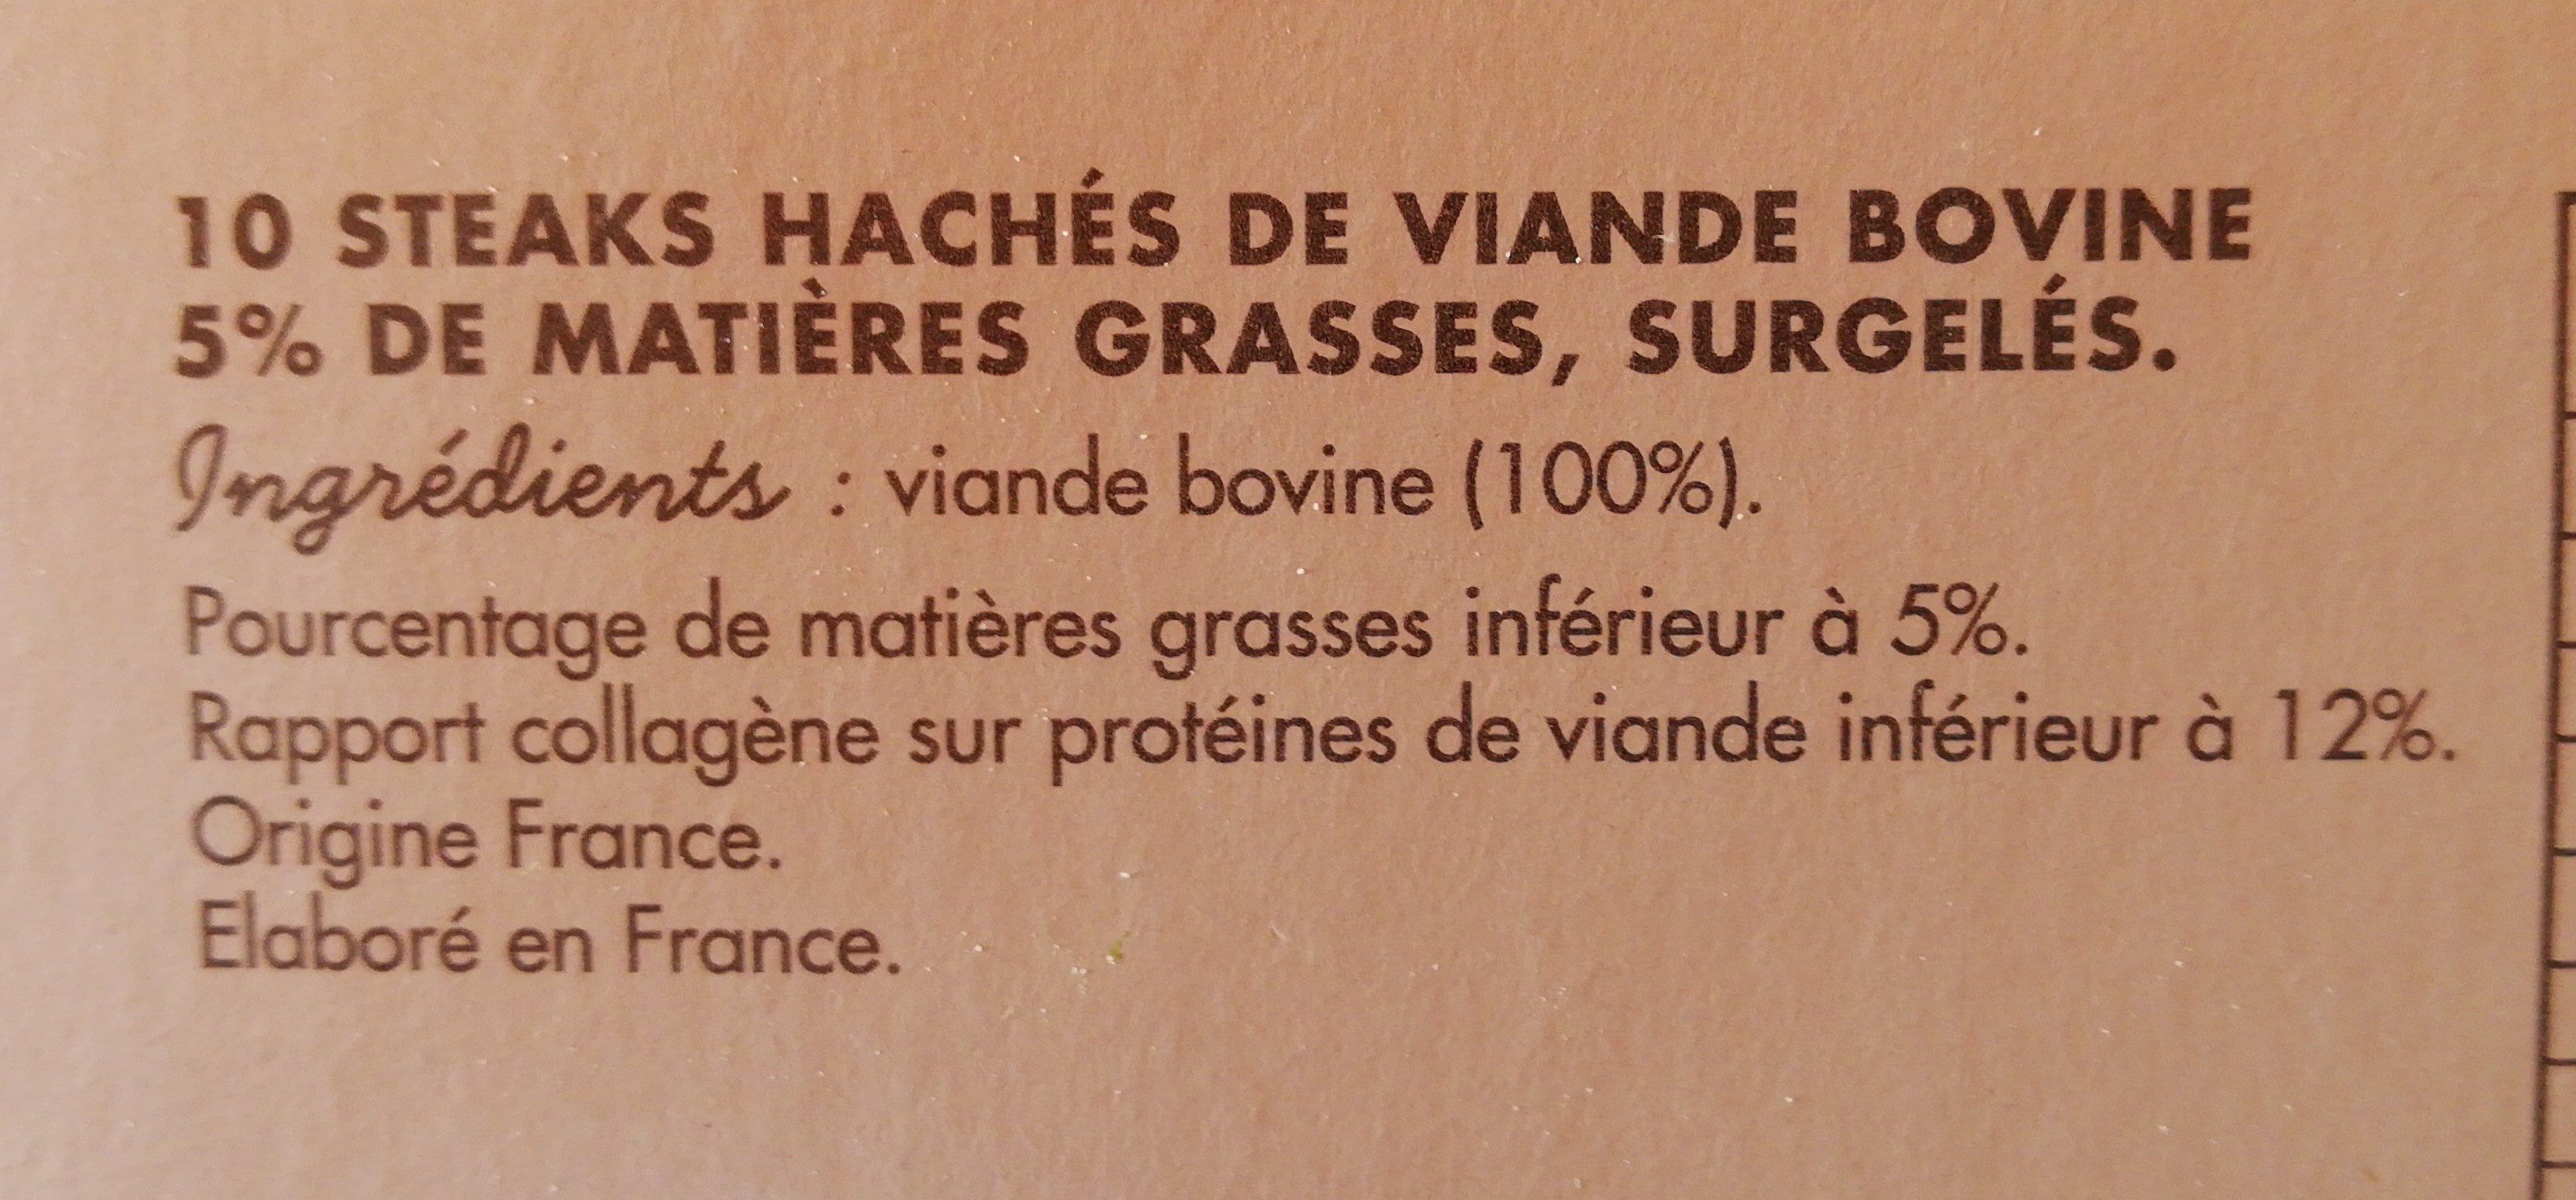 10 steaks hachés pur bœuf 5%matières grasses - Ingrediënten